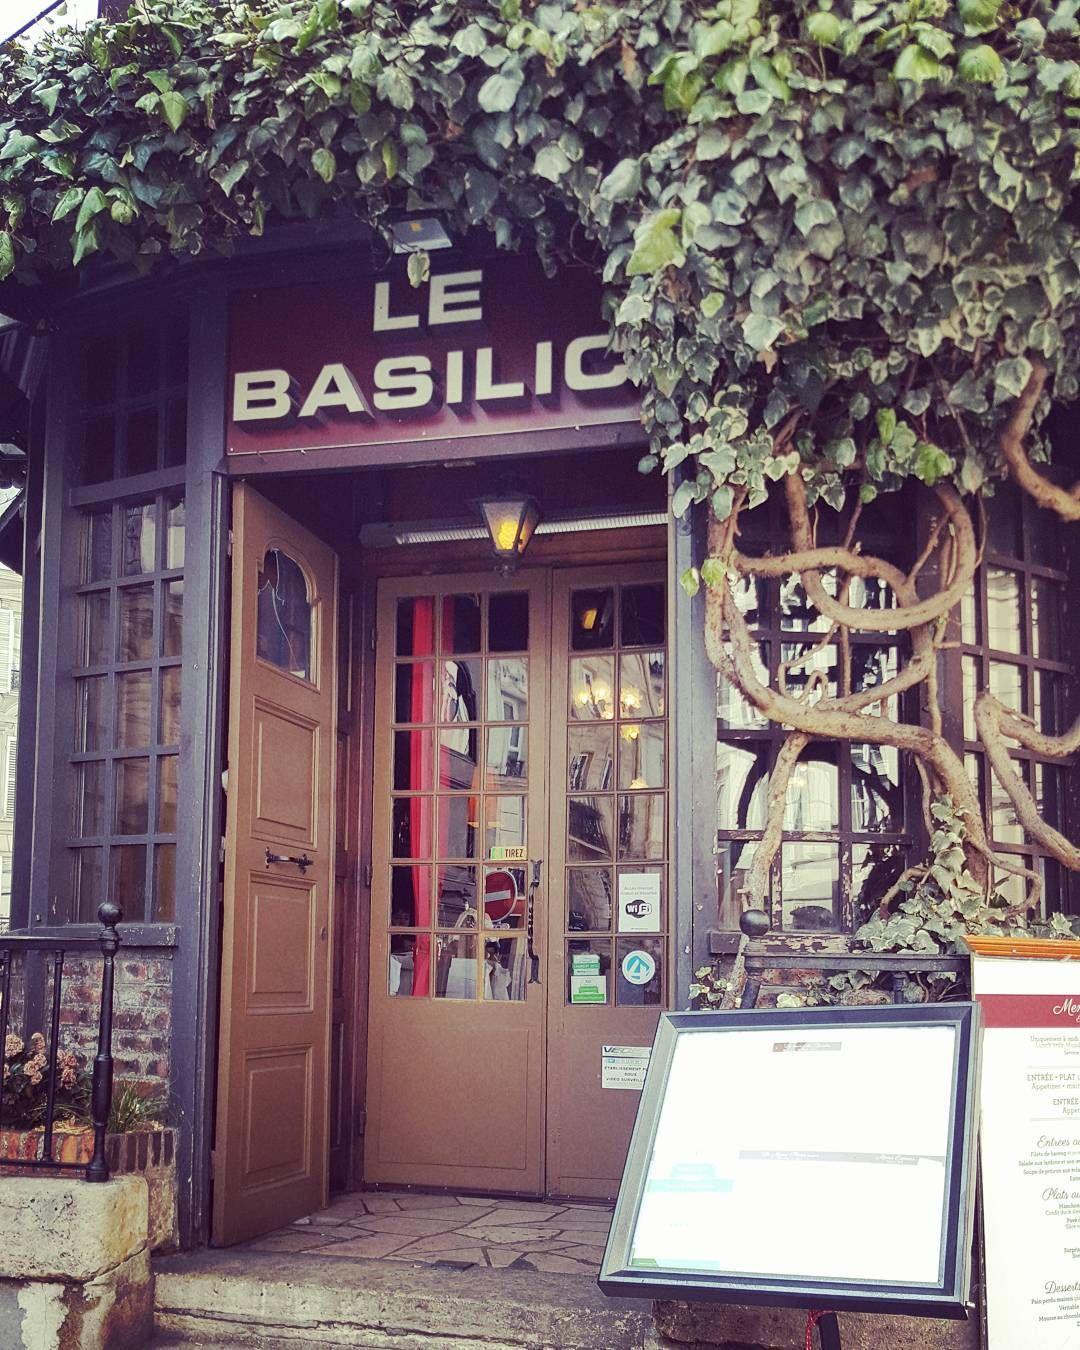 #hcinnamon #lebasilic #montmartre #paris #recomendable #100% #delicious #excelenteservicio